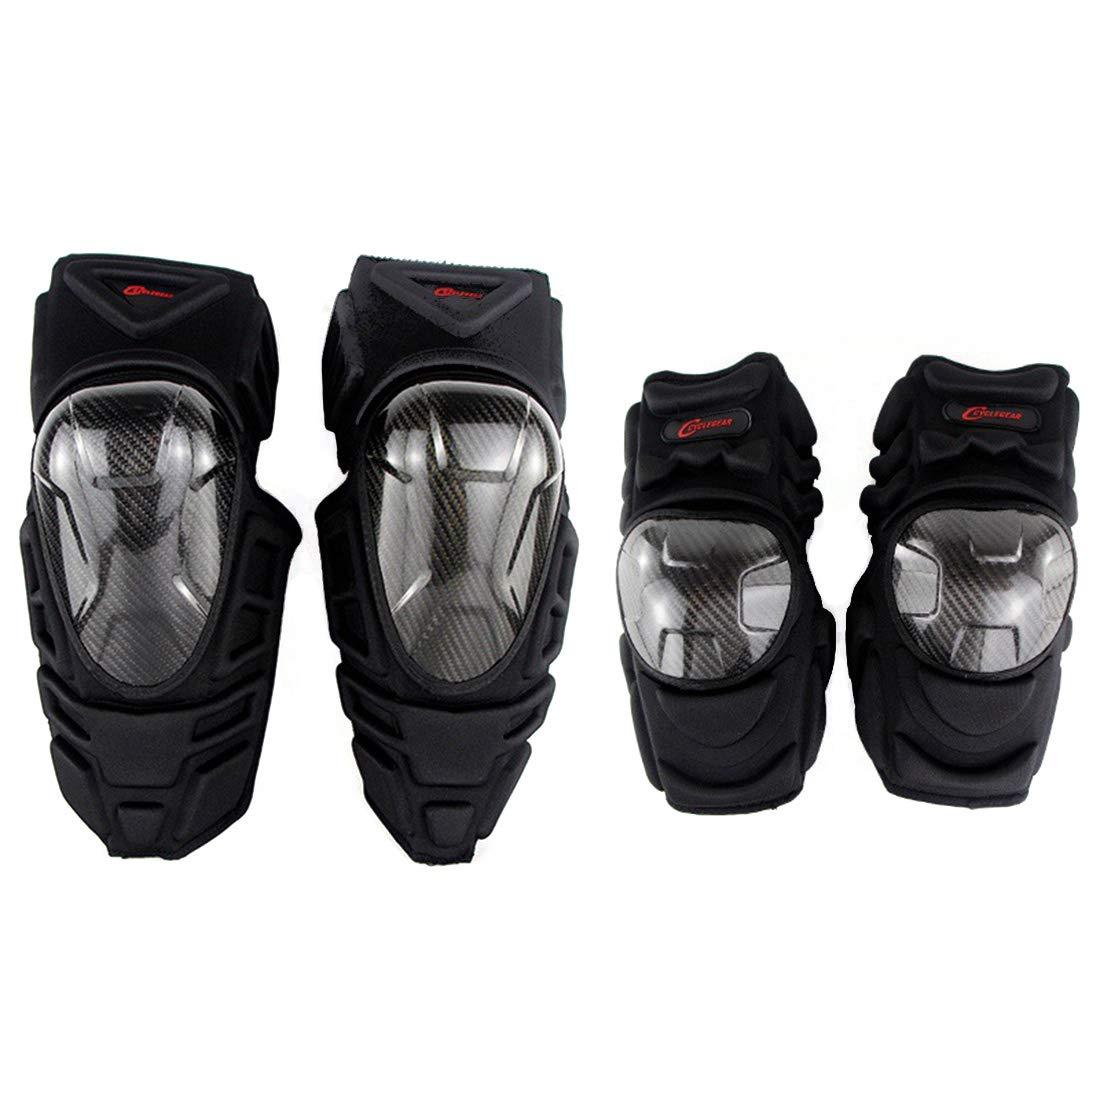 Aeshesn オートバイモトクロスサイクリング肘と膝パッドプロテクターガードアーマーセットブラック4個 (サイズ : 4-piece)  B07QC2JP8J